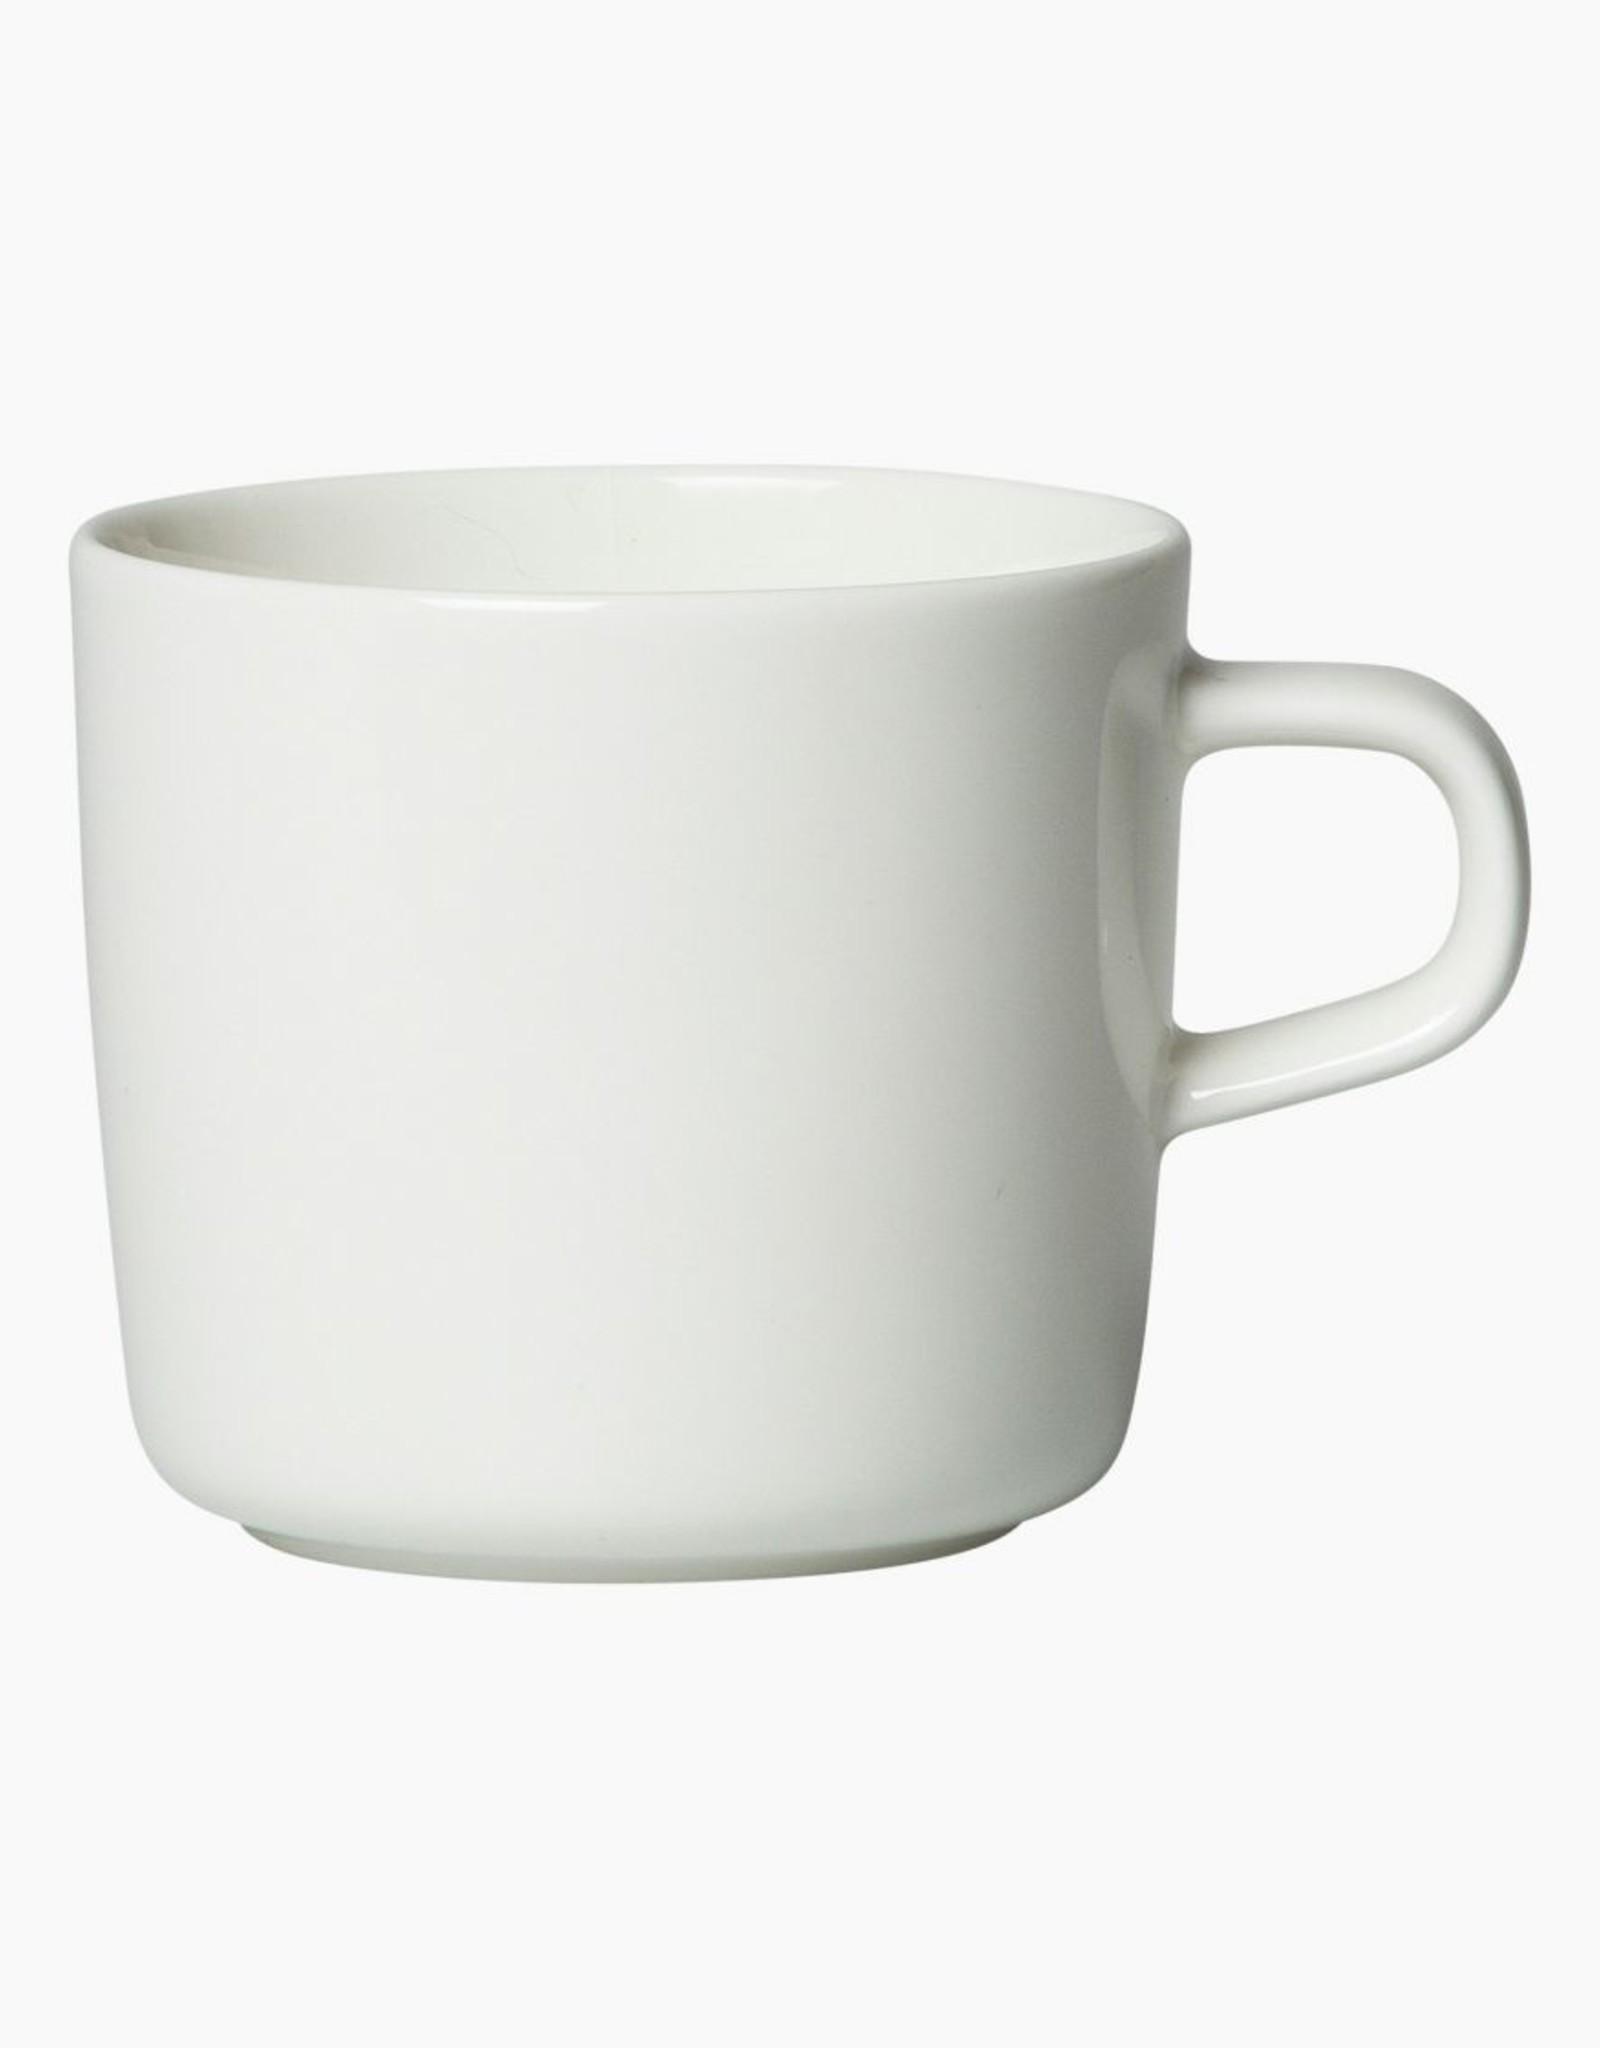 Marimekko Marimekko Oiva koffiekopje 2 dl Wit